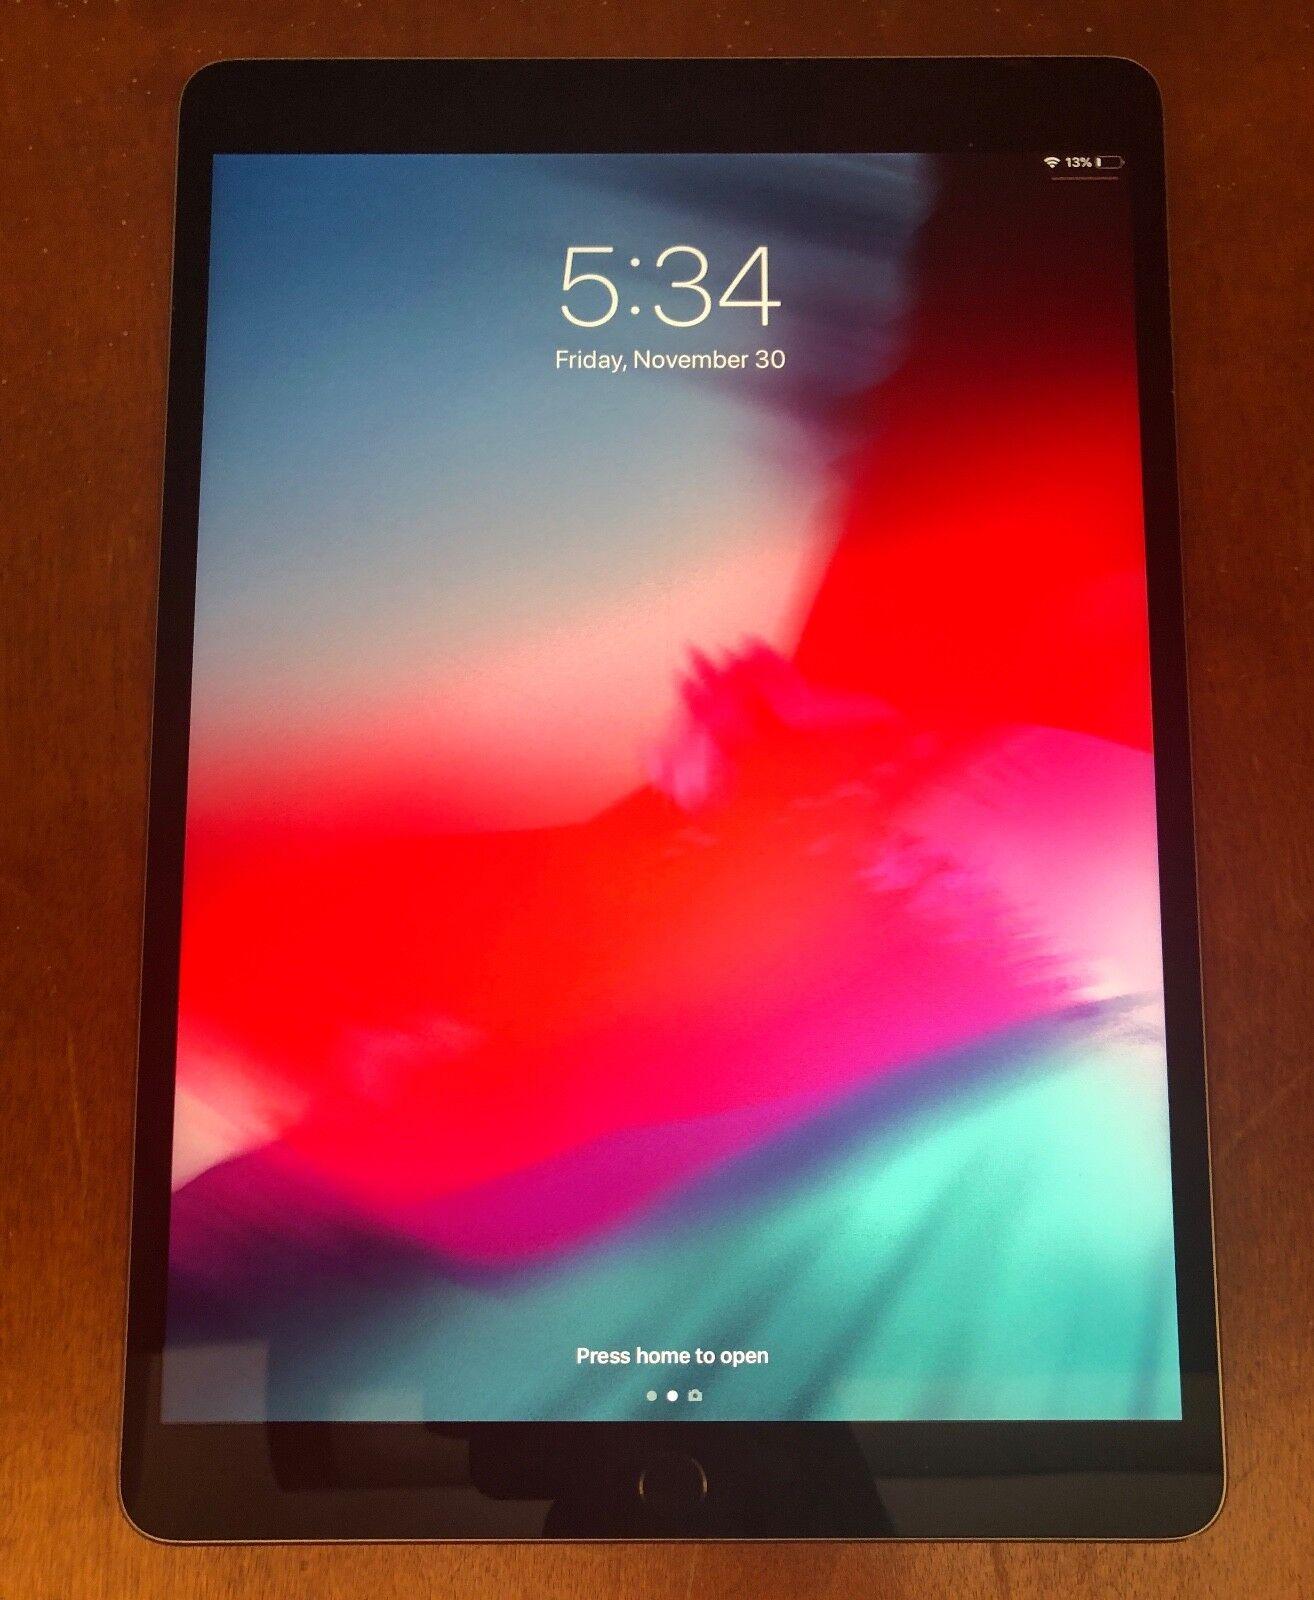 Working Apple iPad Pro 2nd Gen. 256GB, Wi-Fi, 10.5in - Space Gray